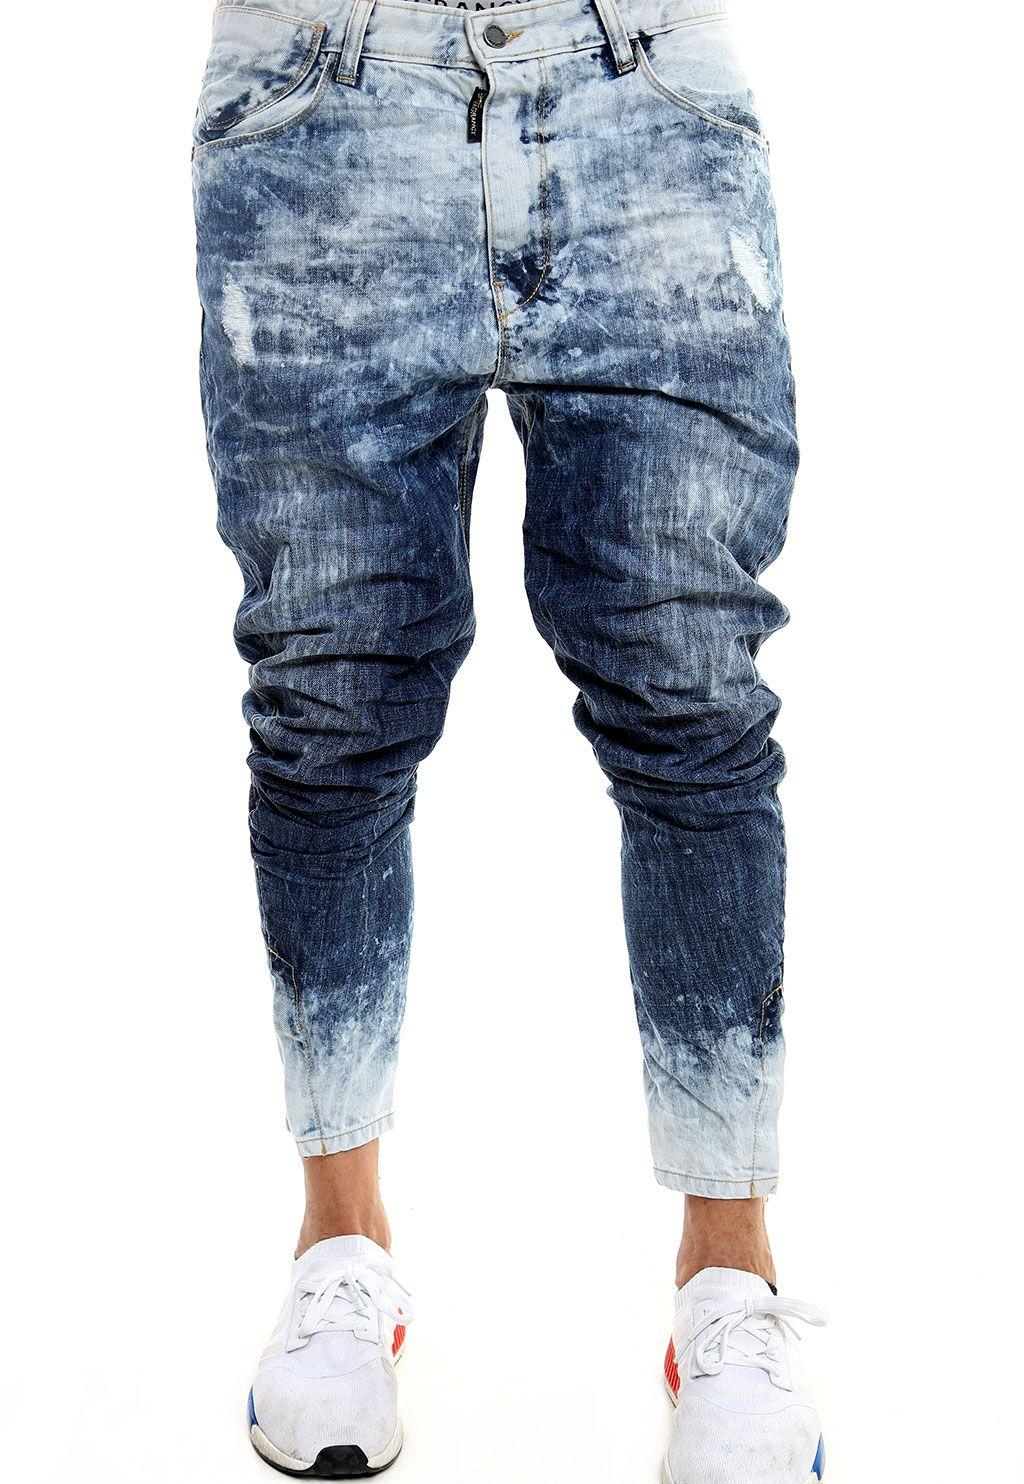 ice cold jeans  handmade  man  denim  vagrancylifestyle Denim Jeans Men,  Jeans bbfdb245d3